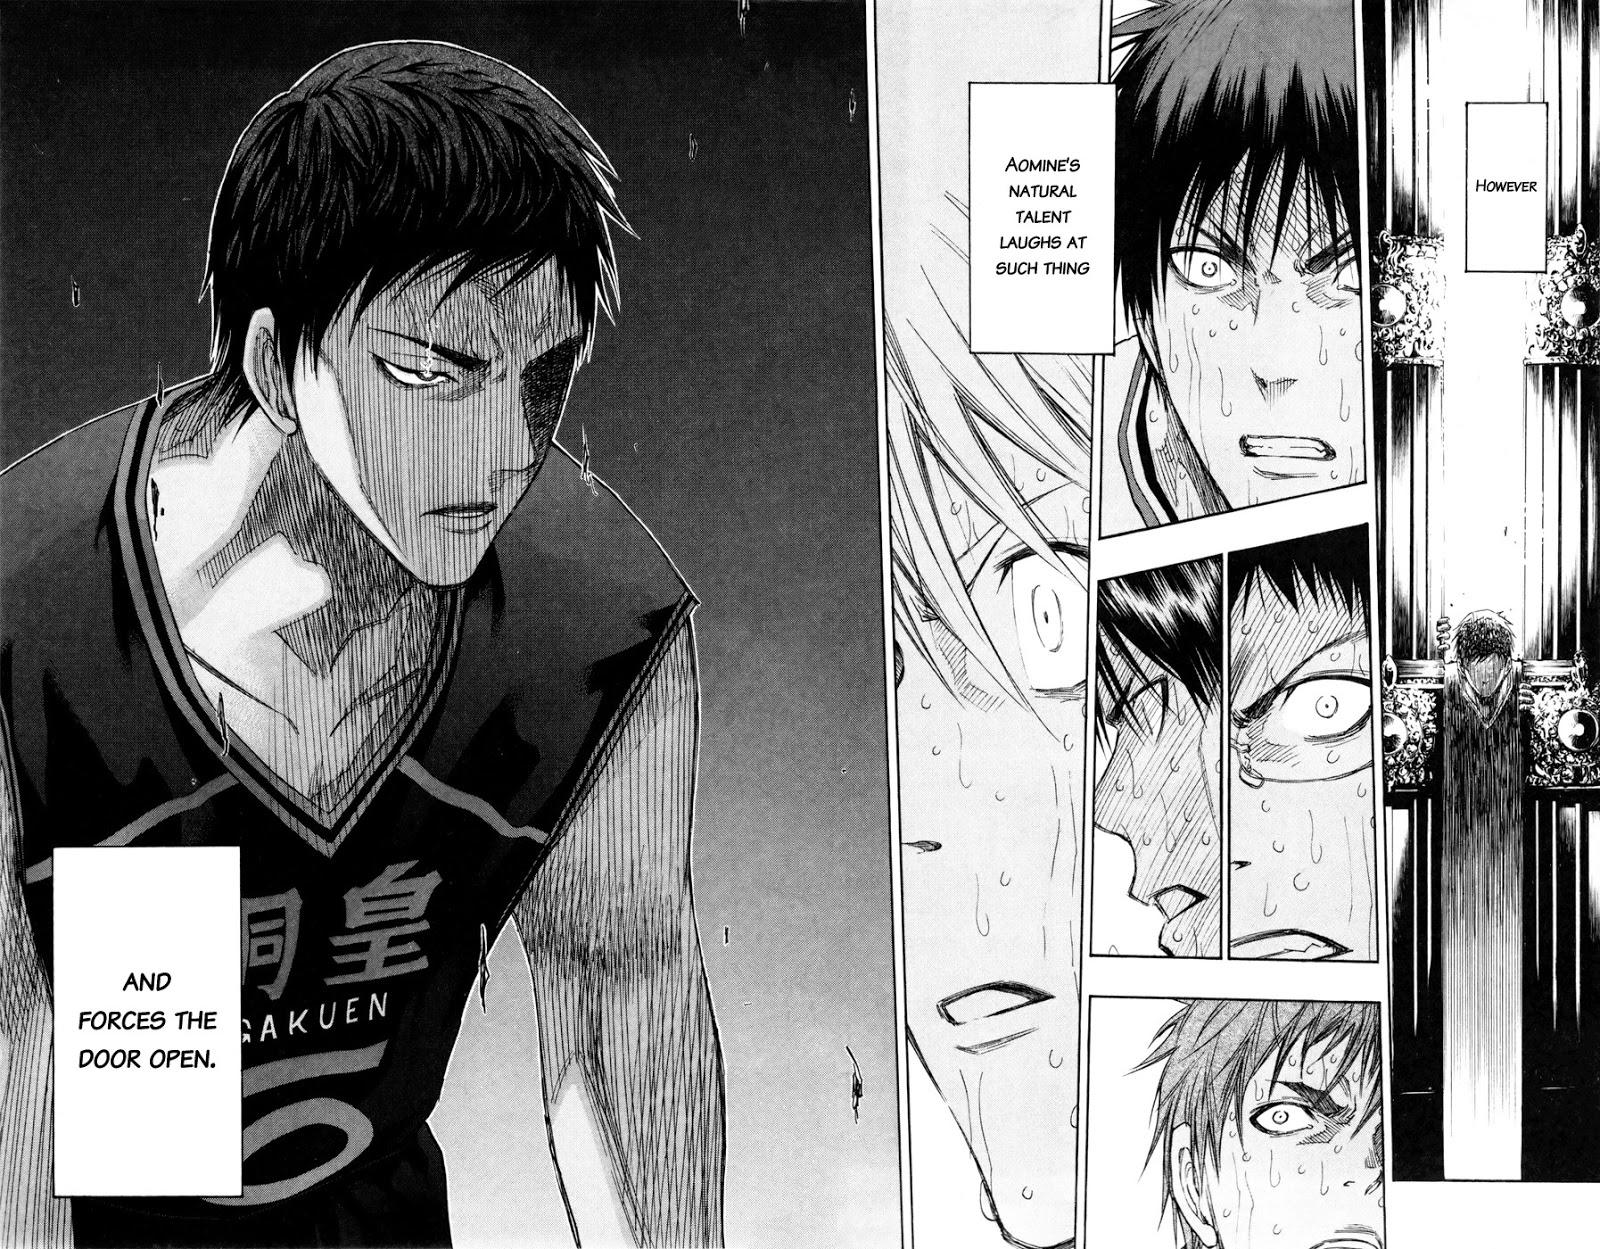 Kuroko no Basket Manga Chapter 133 - Image 14-14